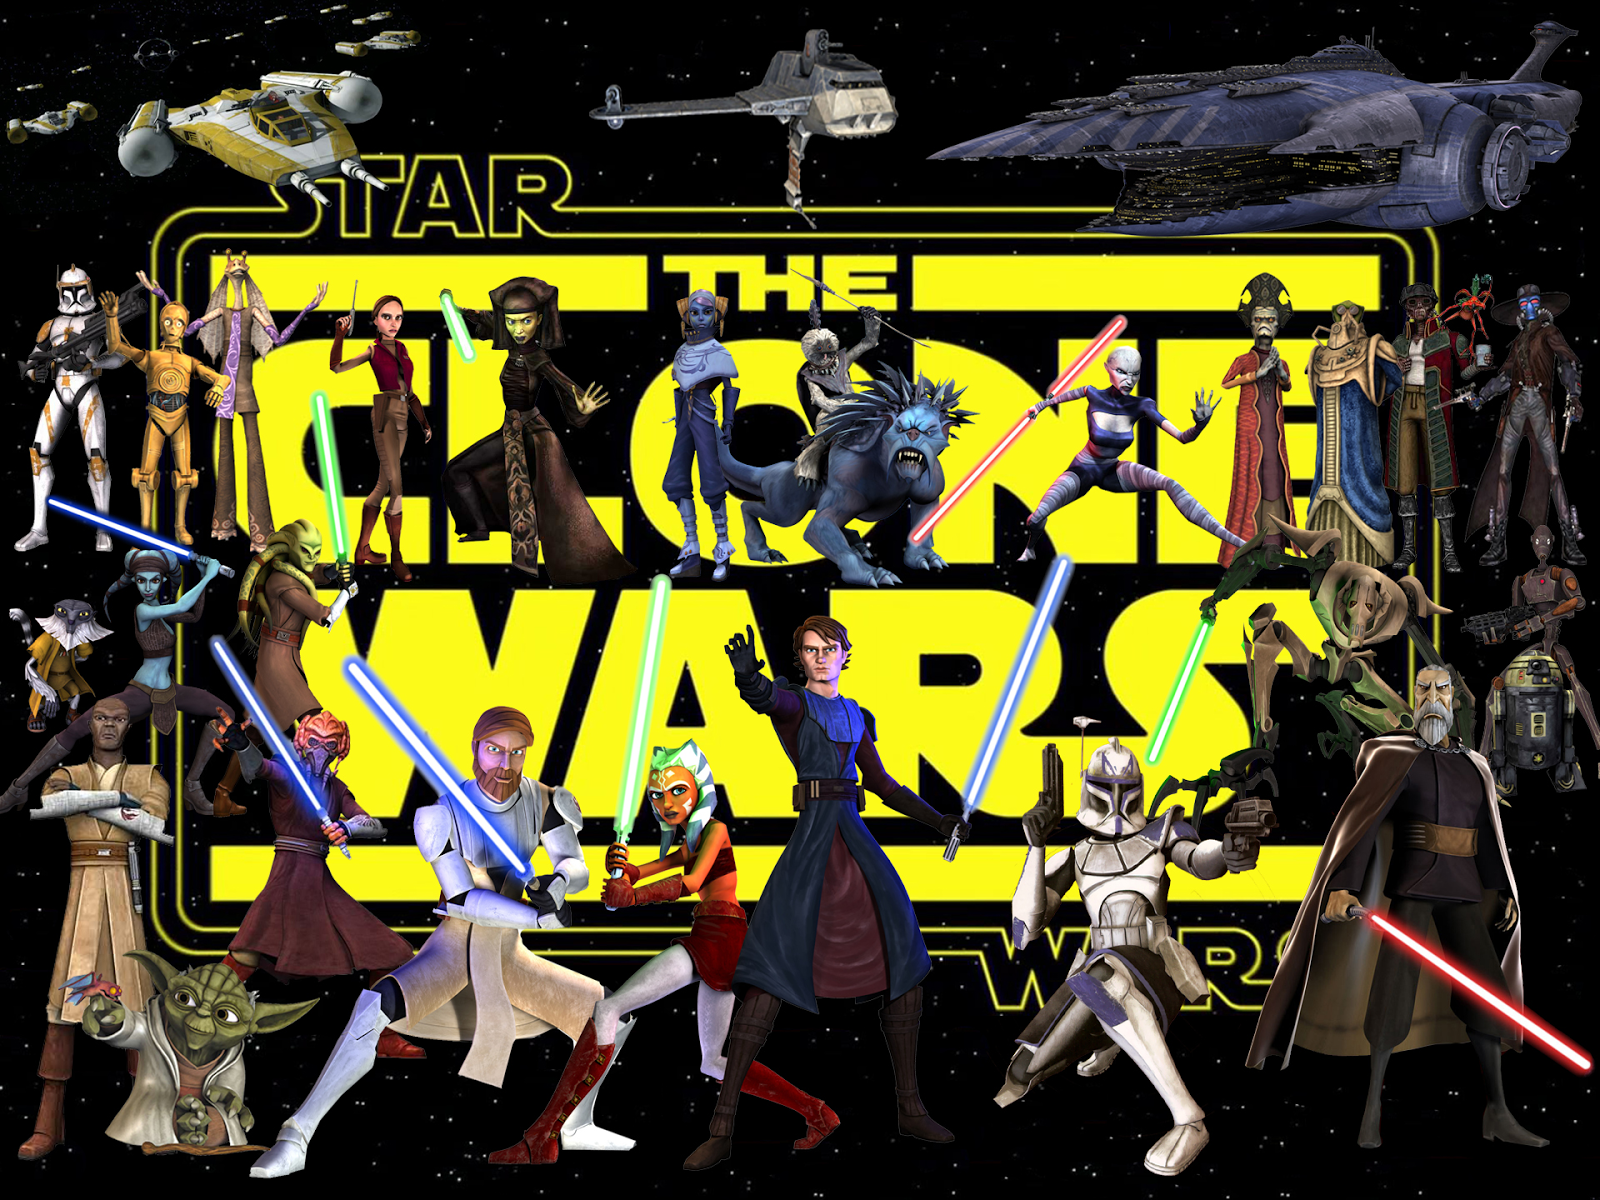 Star wars the clone wars ตอน ที่ 01 star wars